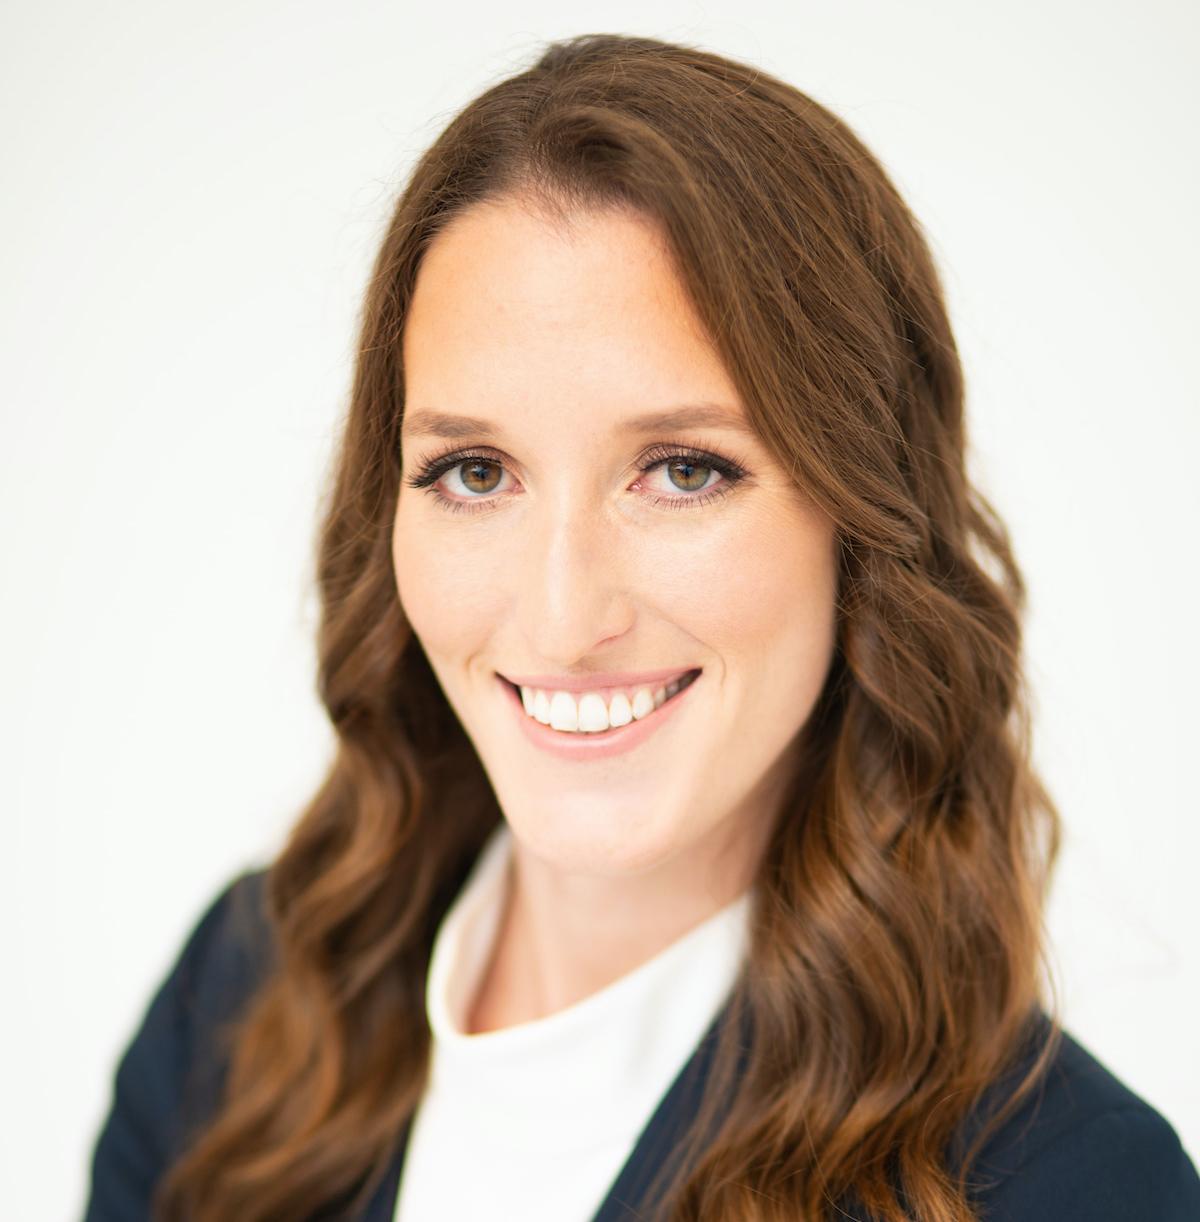 Megan Davis, MD/MBA candidate